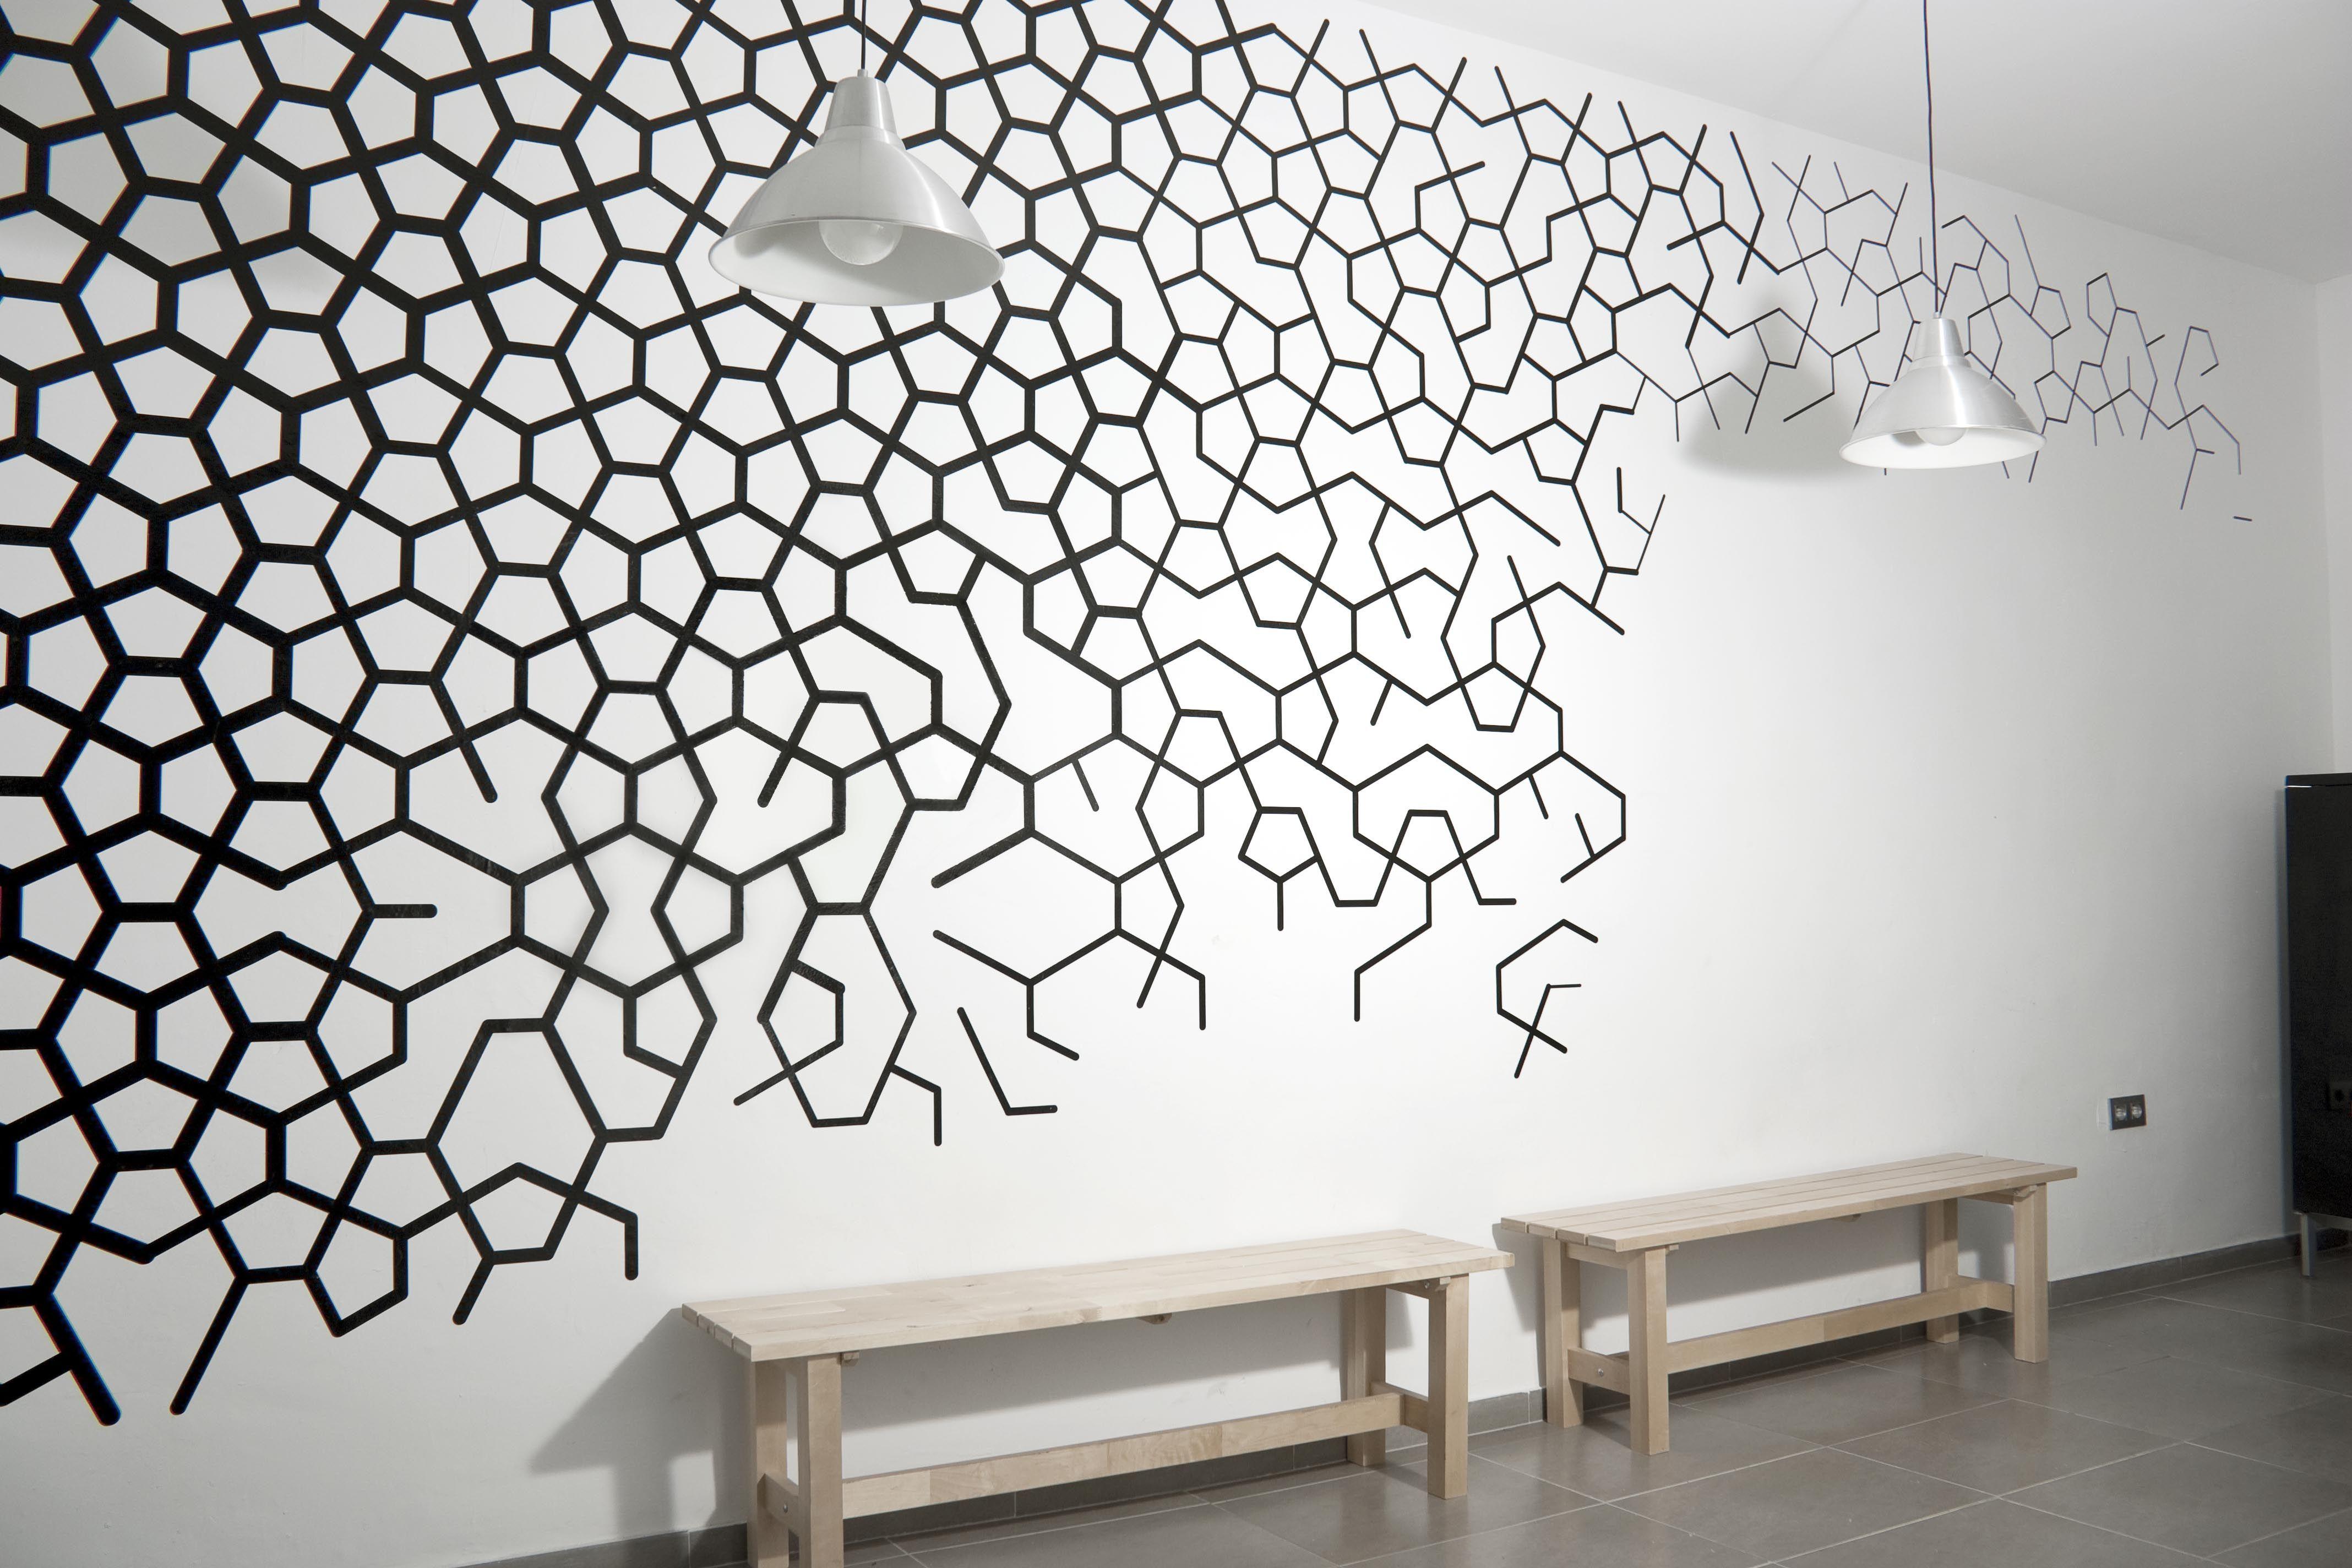 #Geometry #Wall Interesting Geometric Pattern As Well Art